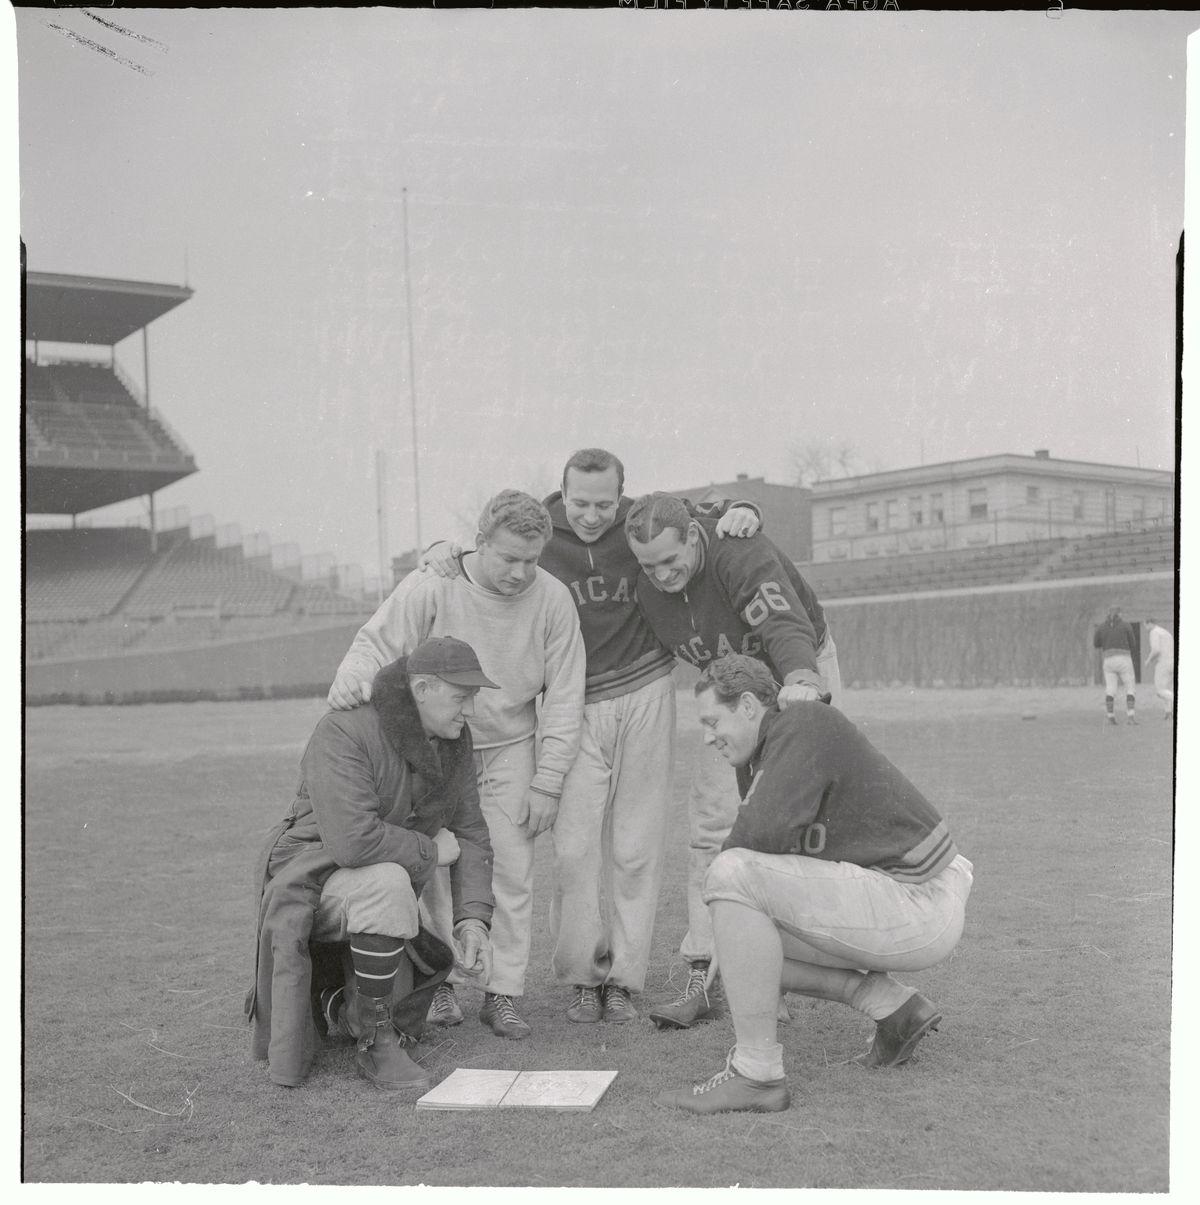 Bears Teammates Posing on The Field